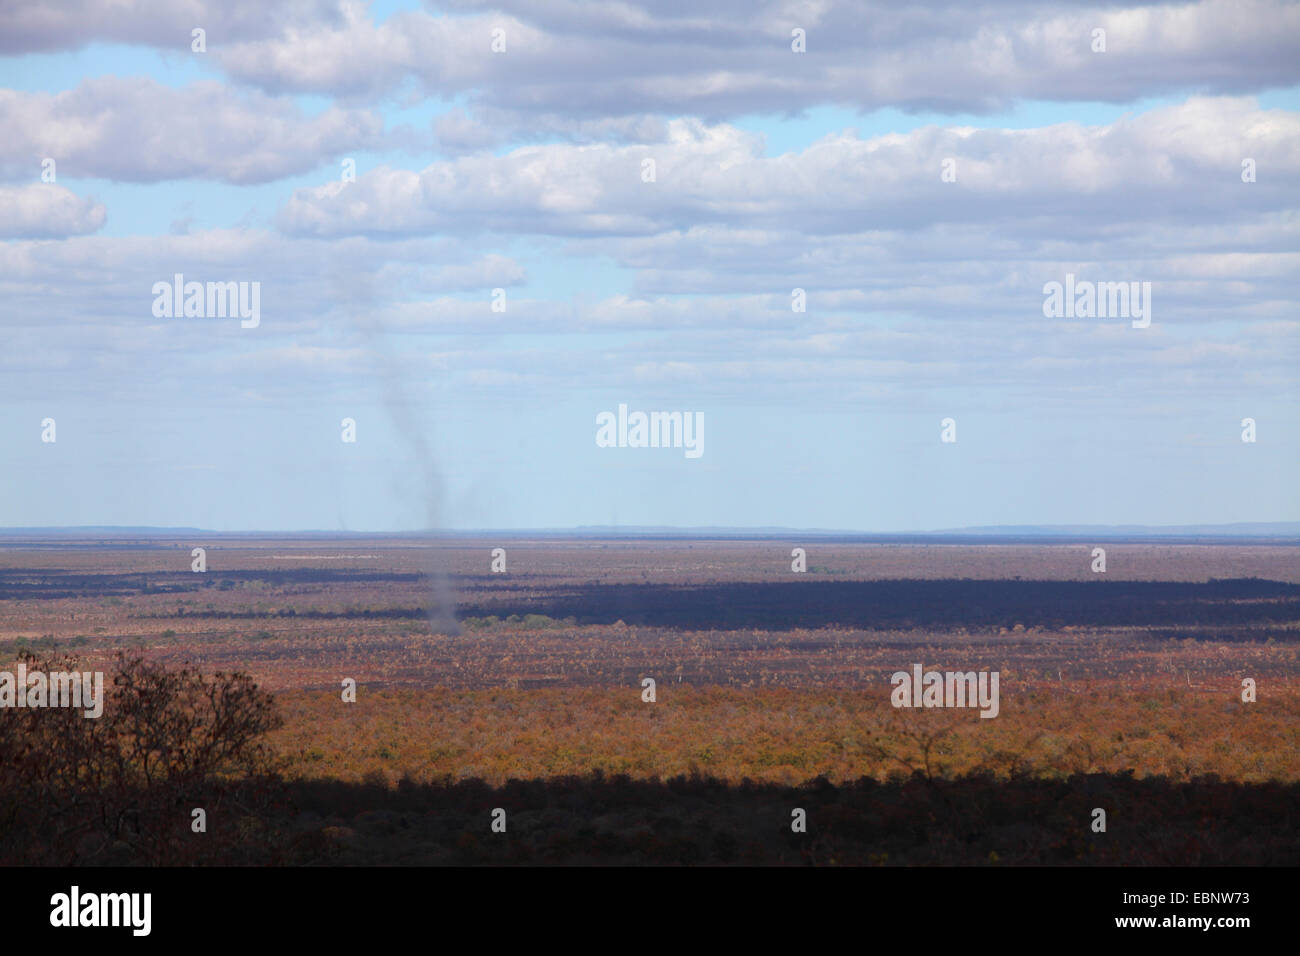 tornado over savanna, South Africa, Kruger National Park, Babalala, Punda Maria - Stock Image